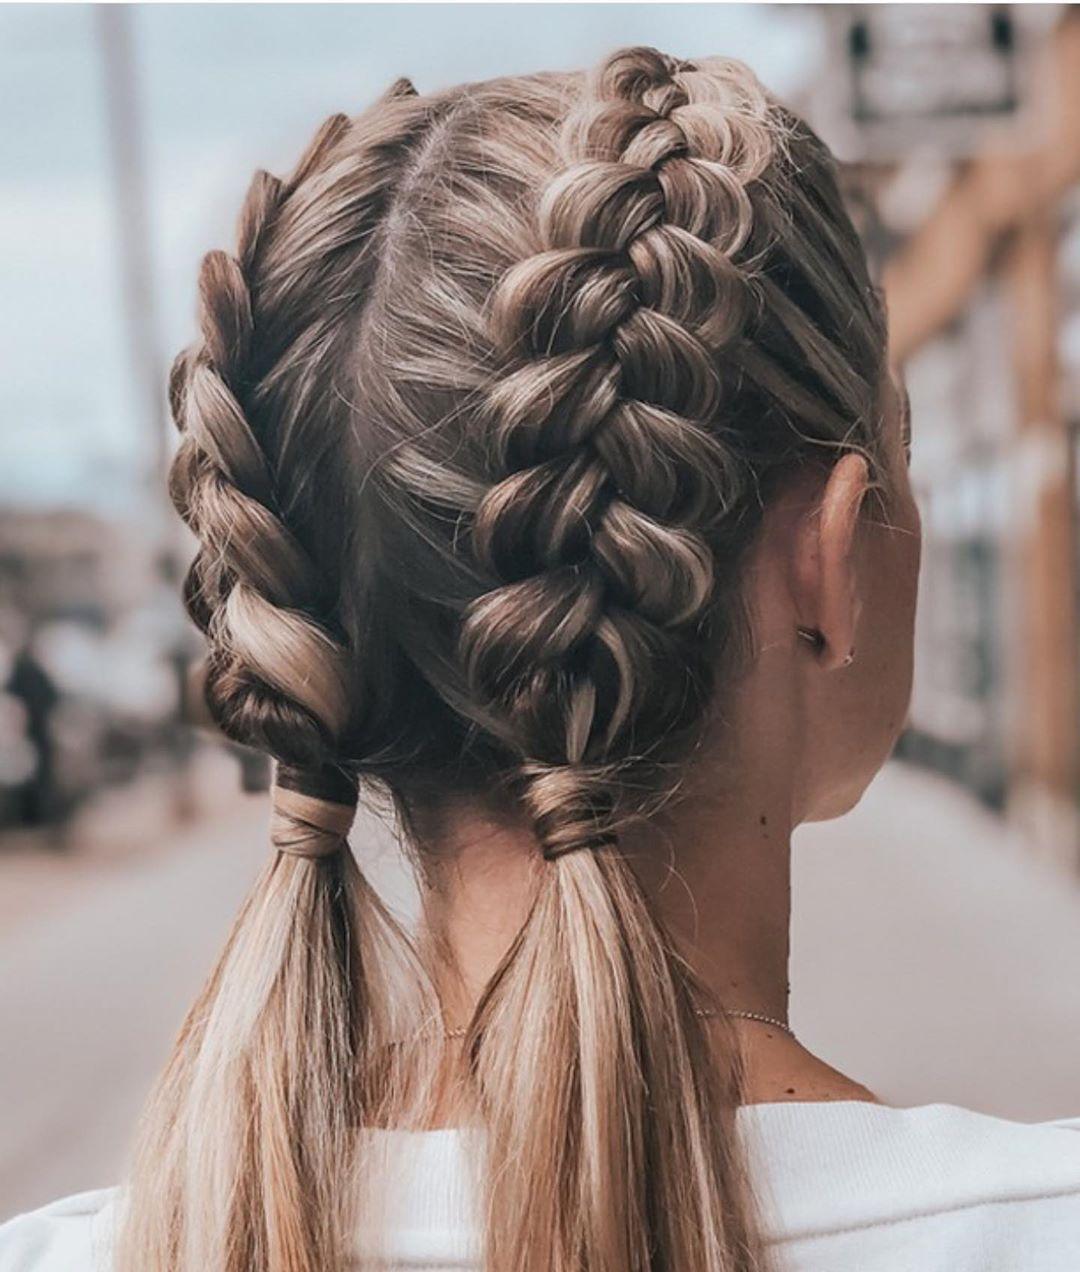 10 Trendy Braided Hairstyles In Summer Hairstyles For Long Hair 2021 In 2021 Long Hair Styles Braids For Long Hair Braided Hairstyles